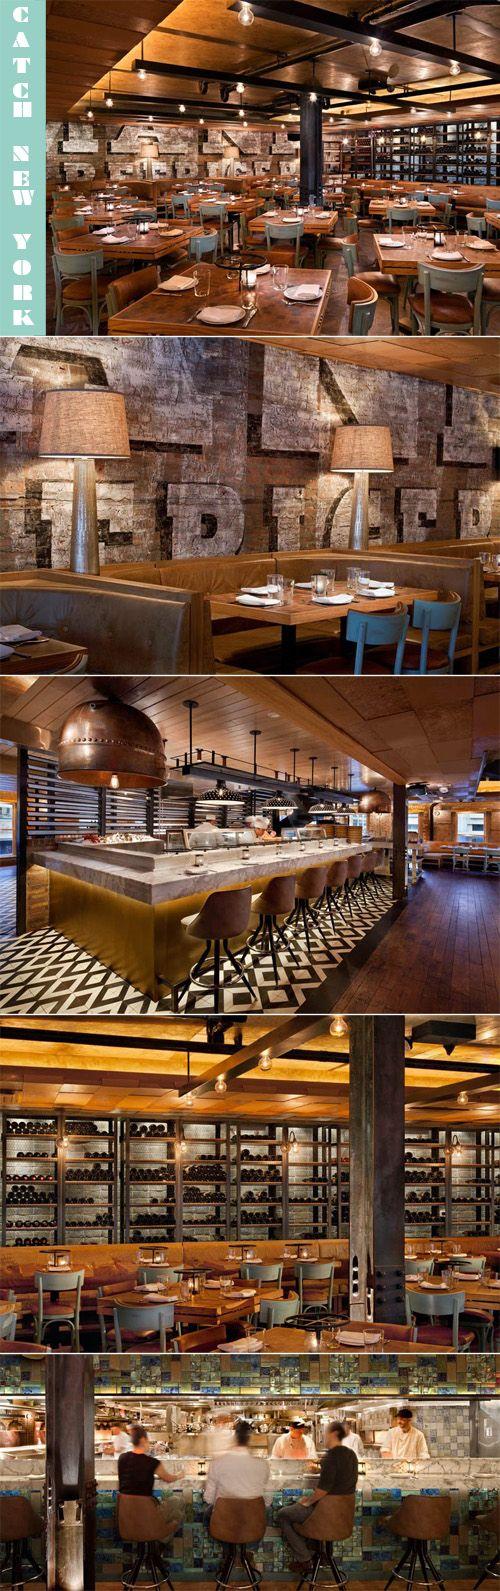 Rustic restaurant furniture - Rustic Restaurant Interior Mackenzie Jones One Of The Coolest Decorated Restaurants Right By